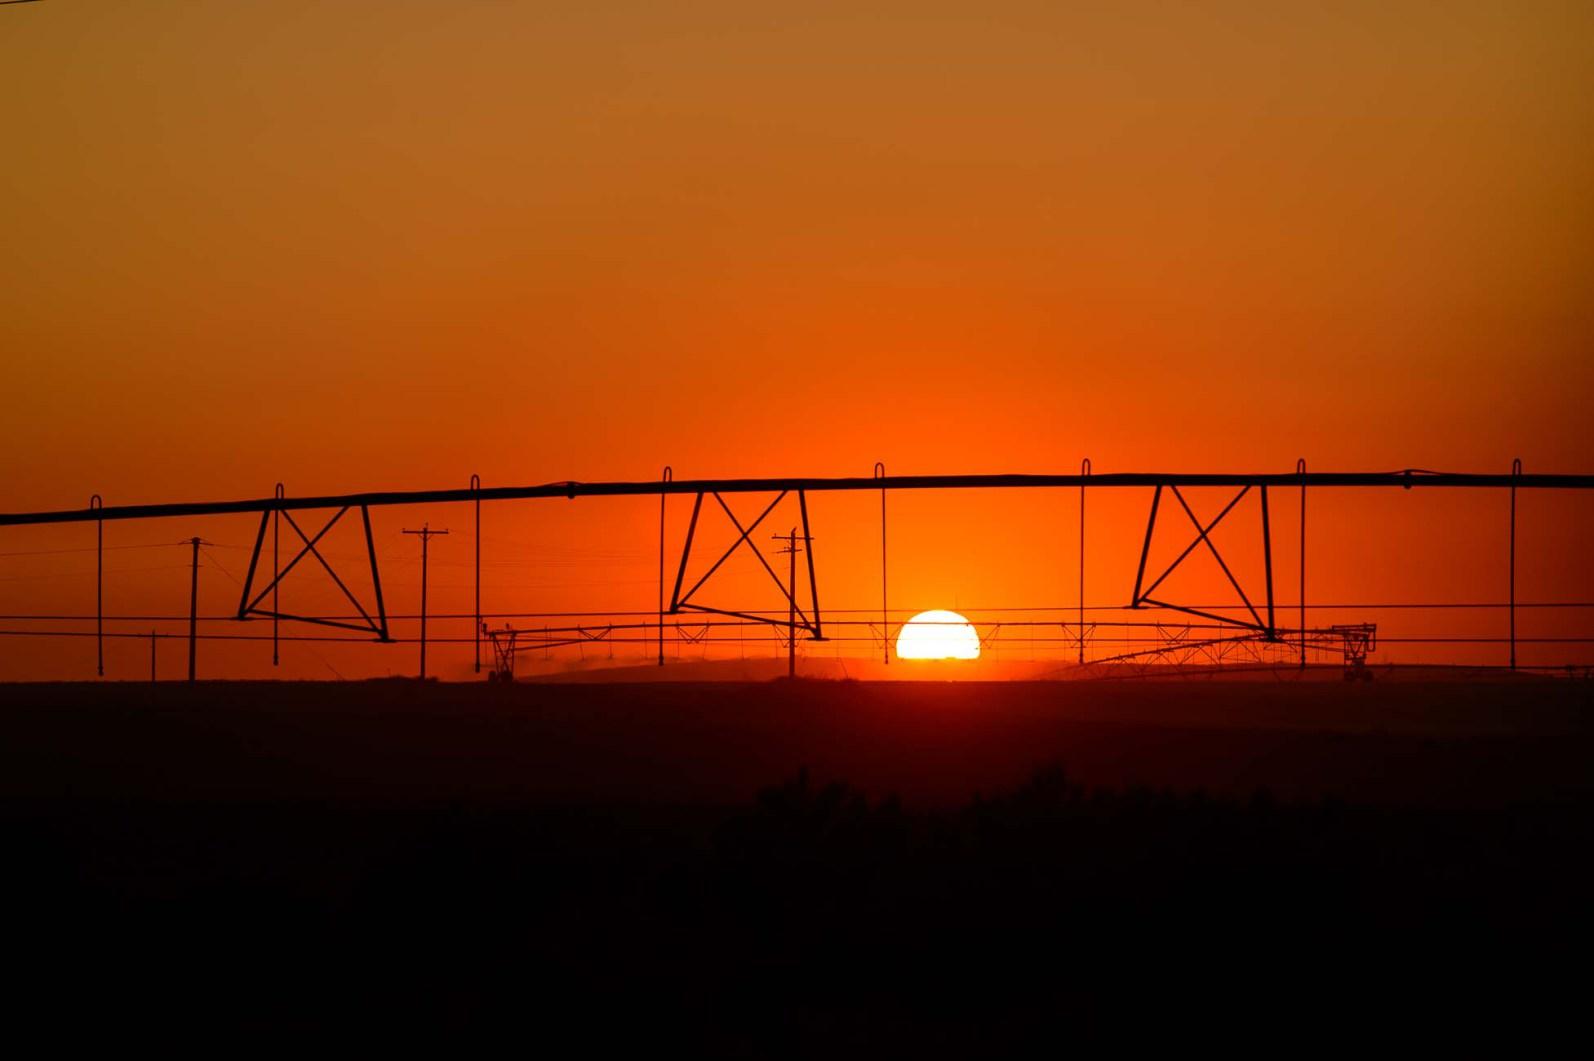 sunset, Monday August 21, 2017.